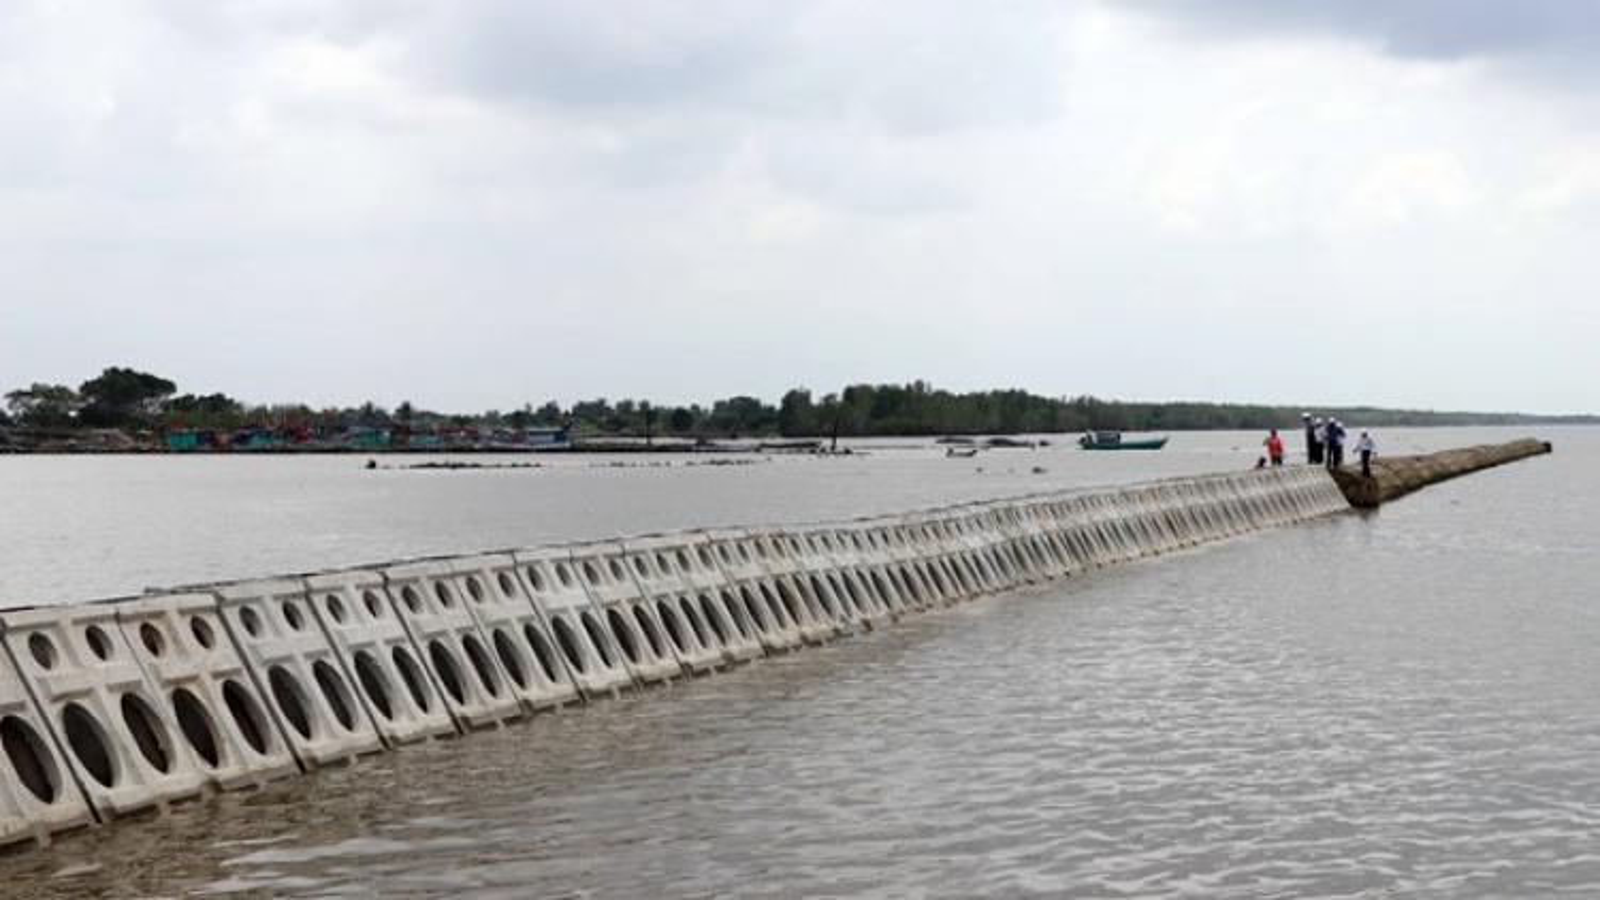 More than VND300 billion to build sea dyke in Thua Thien-Hue